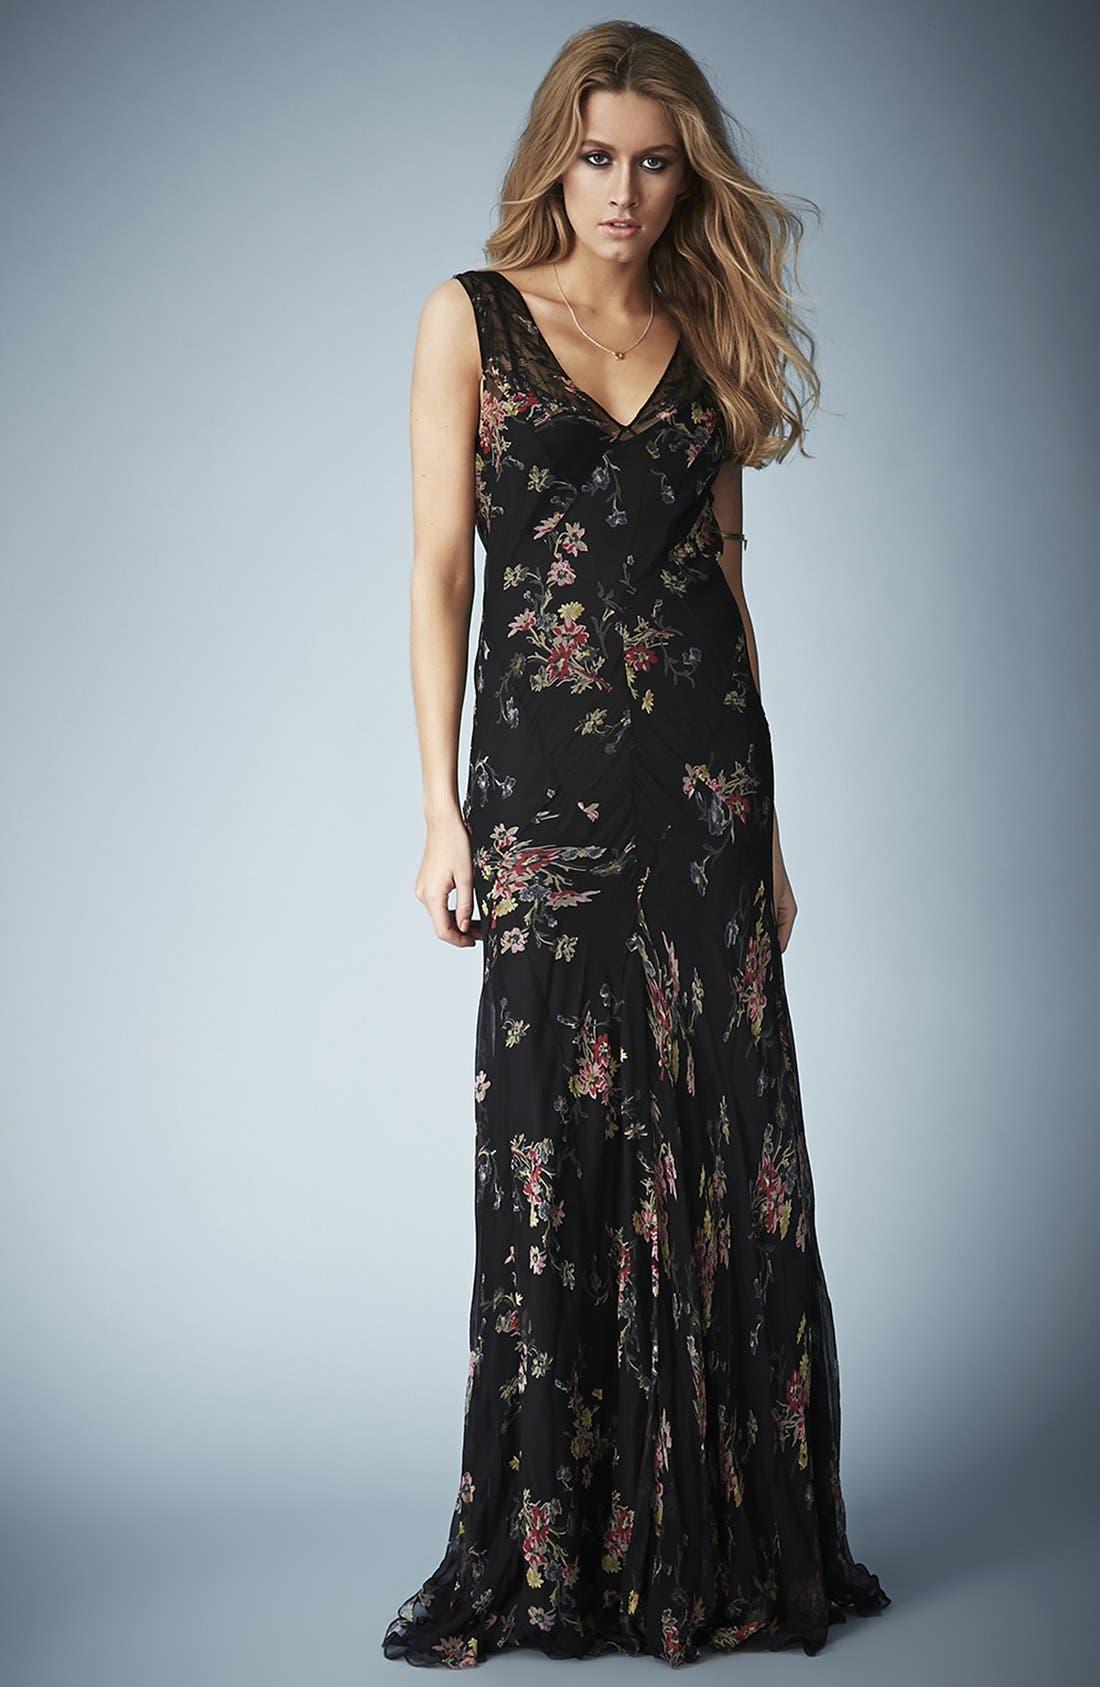 Main Image - Kate Moss for Topshop Floral Chiffon Maxi Dress